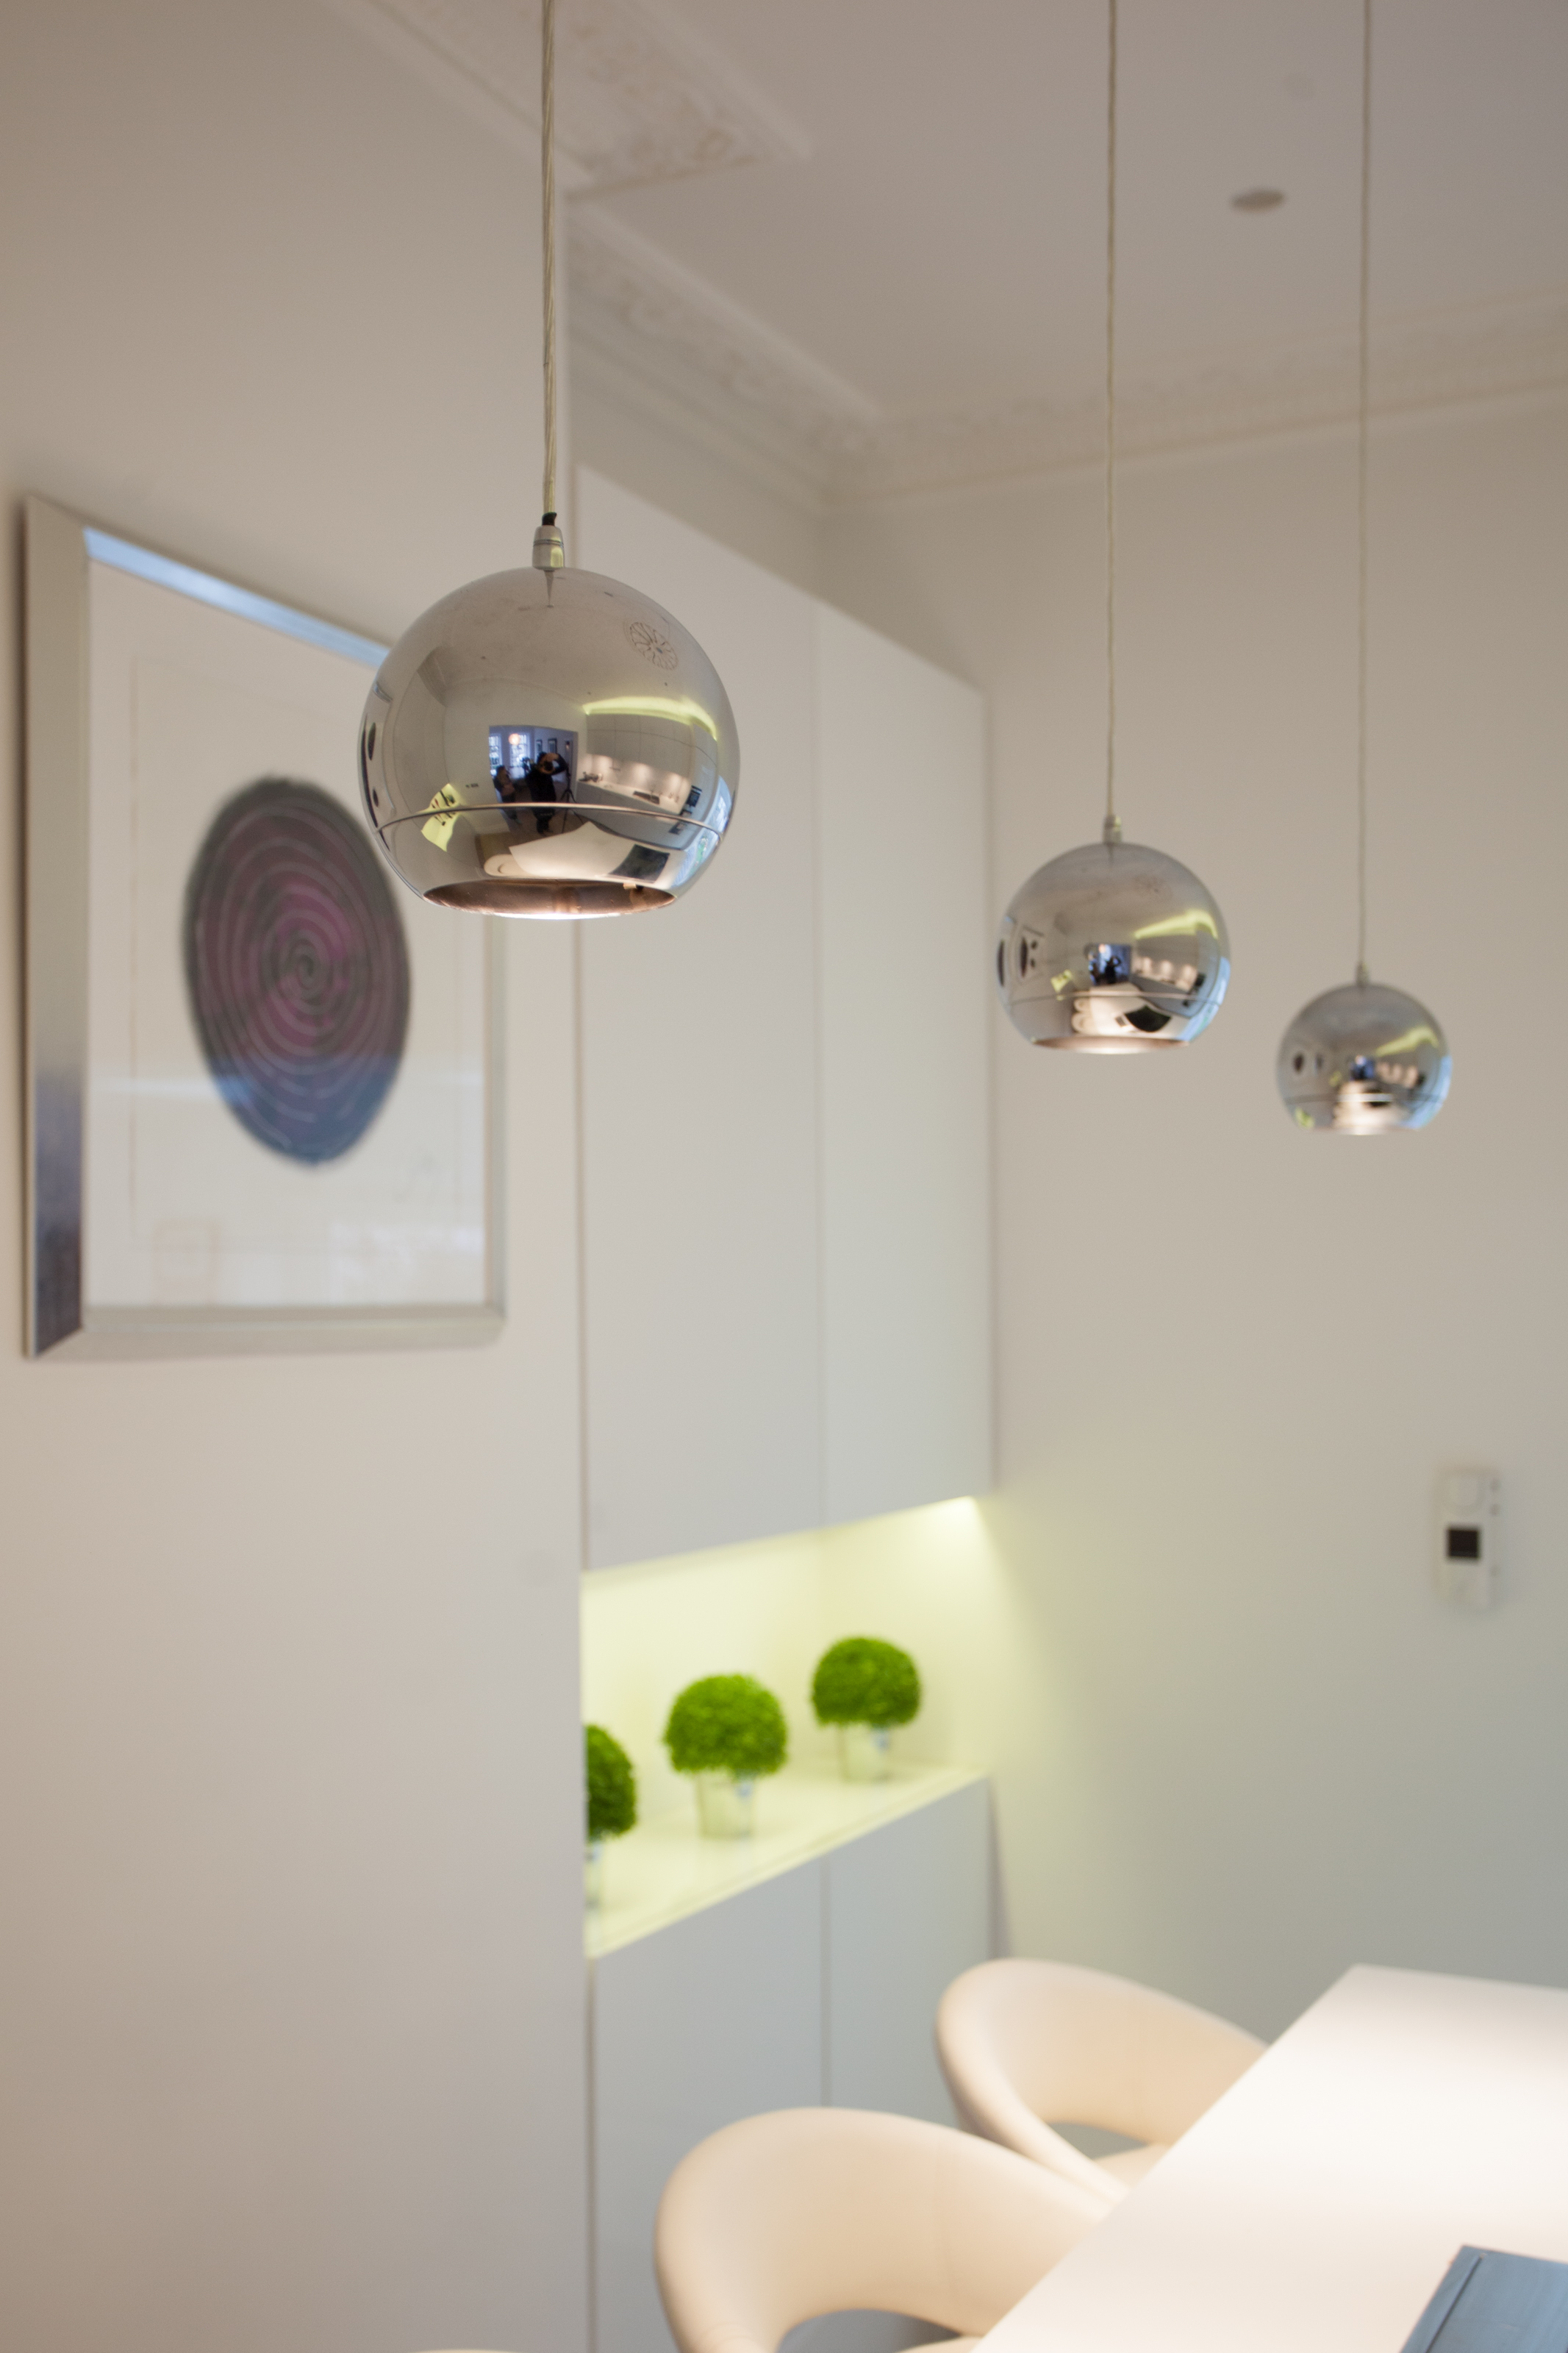 contemporary white kitchen island with pendant lights above kitchen island and contemporary artwork